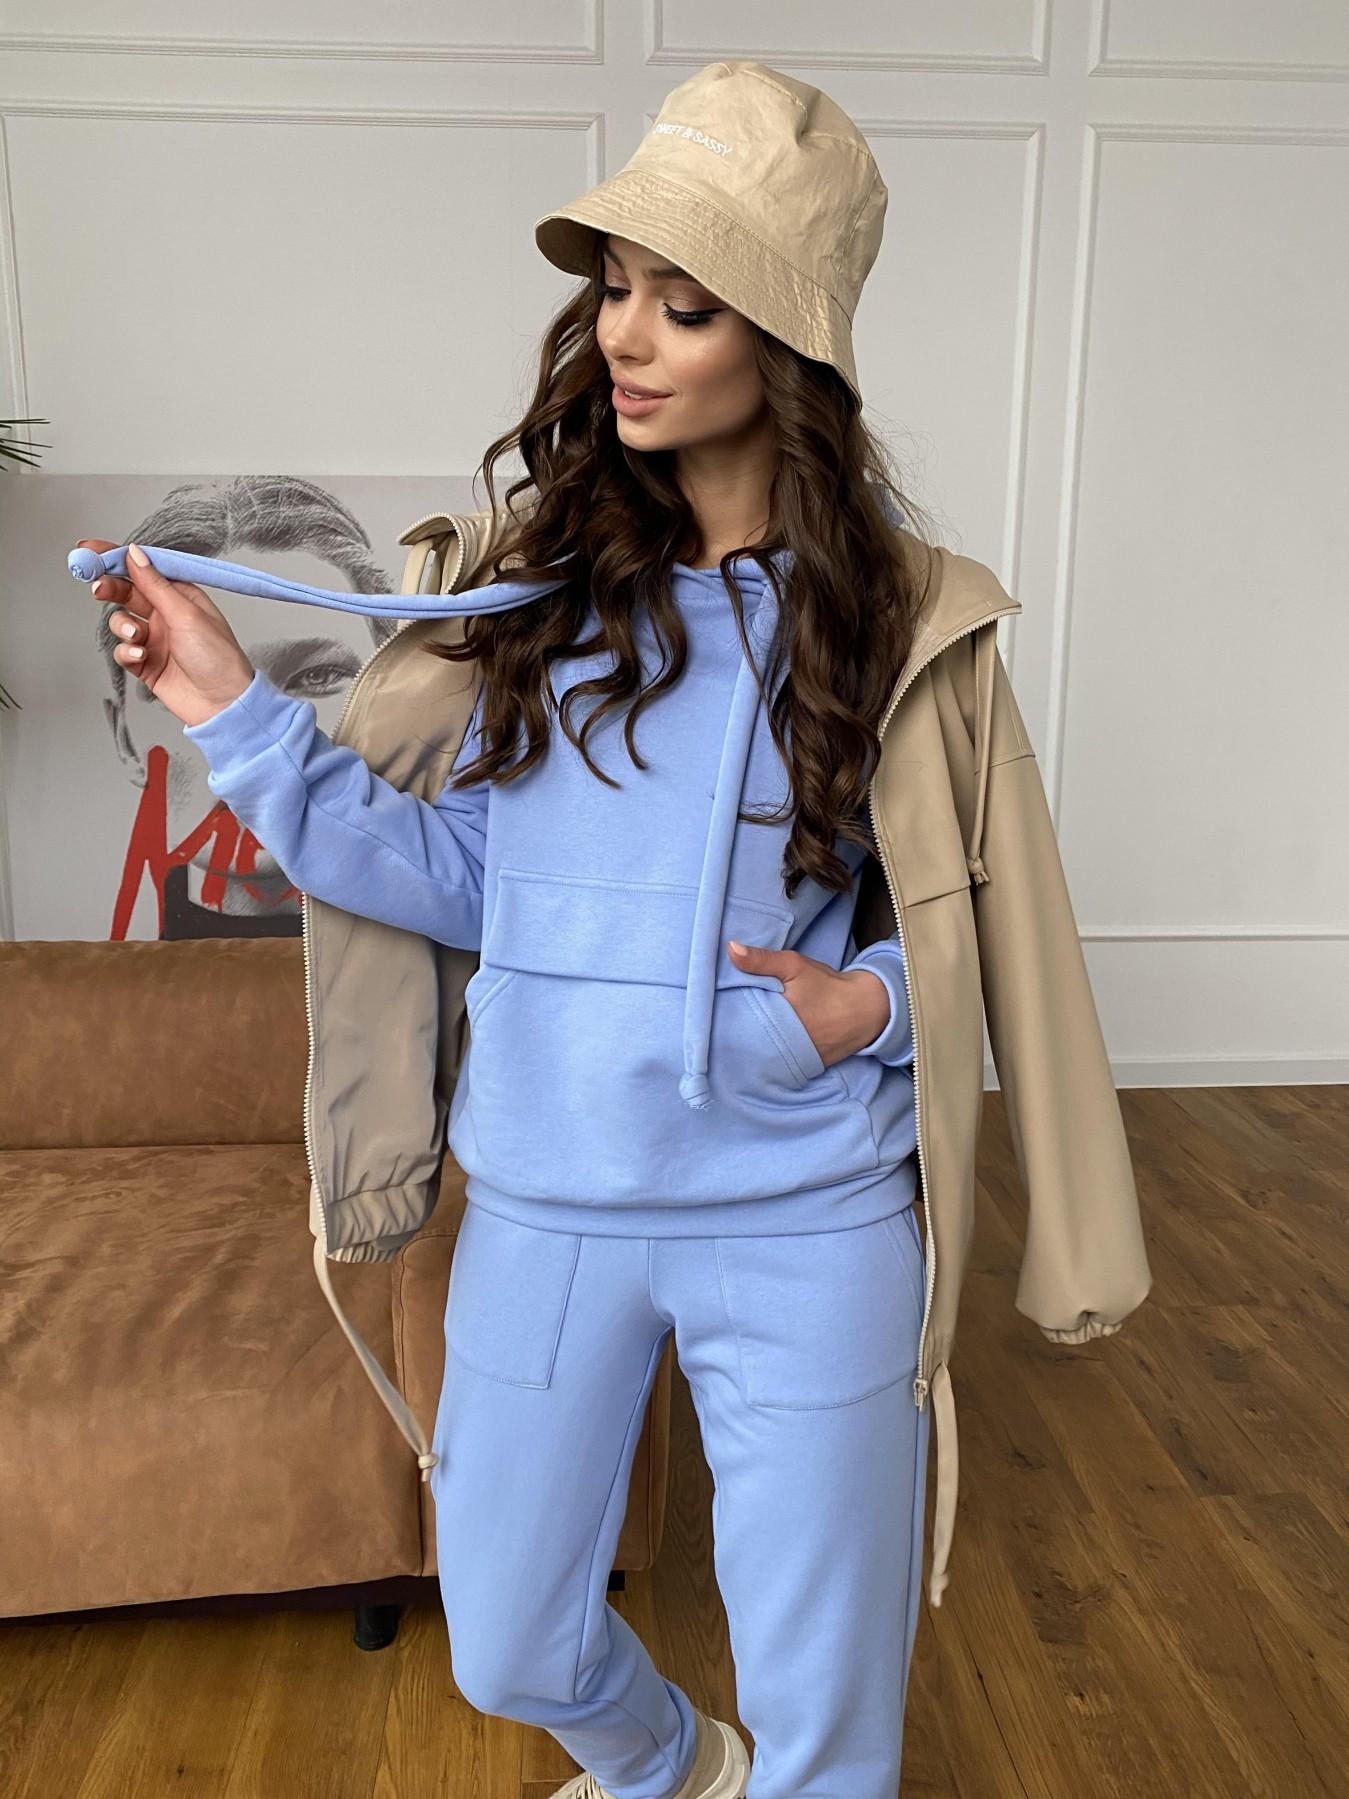 Бруклин костюм из 3х нитки  10579 АРТ. 46954 Цвет: Голубой - фото 4, интернет магазин tm-modus.ru